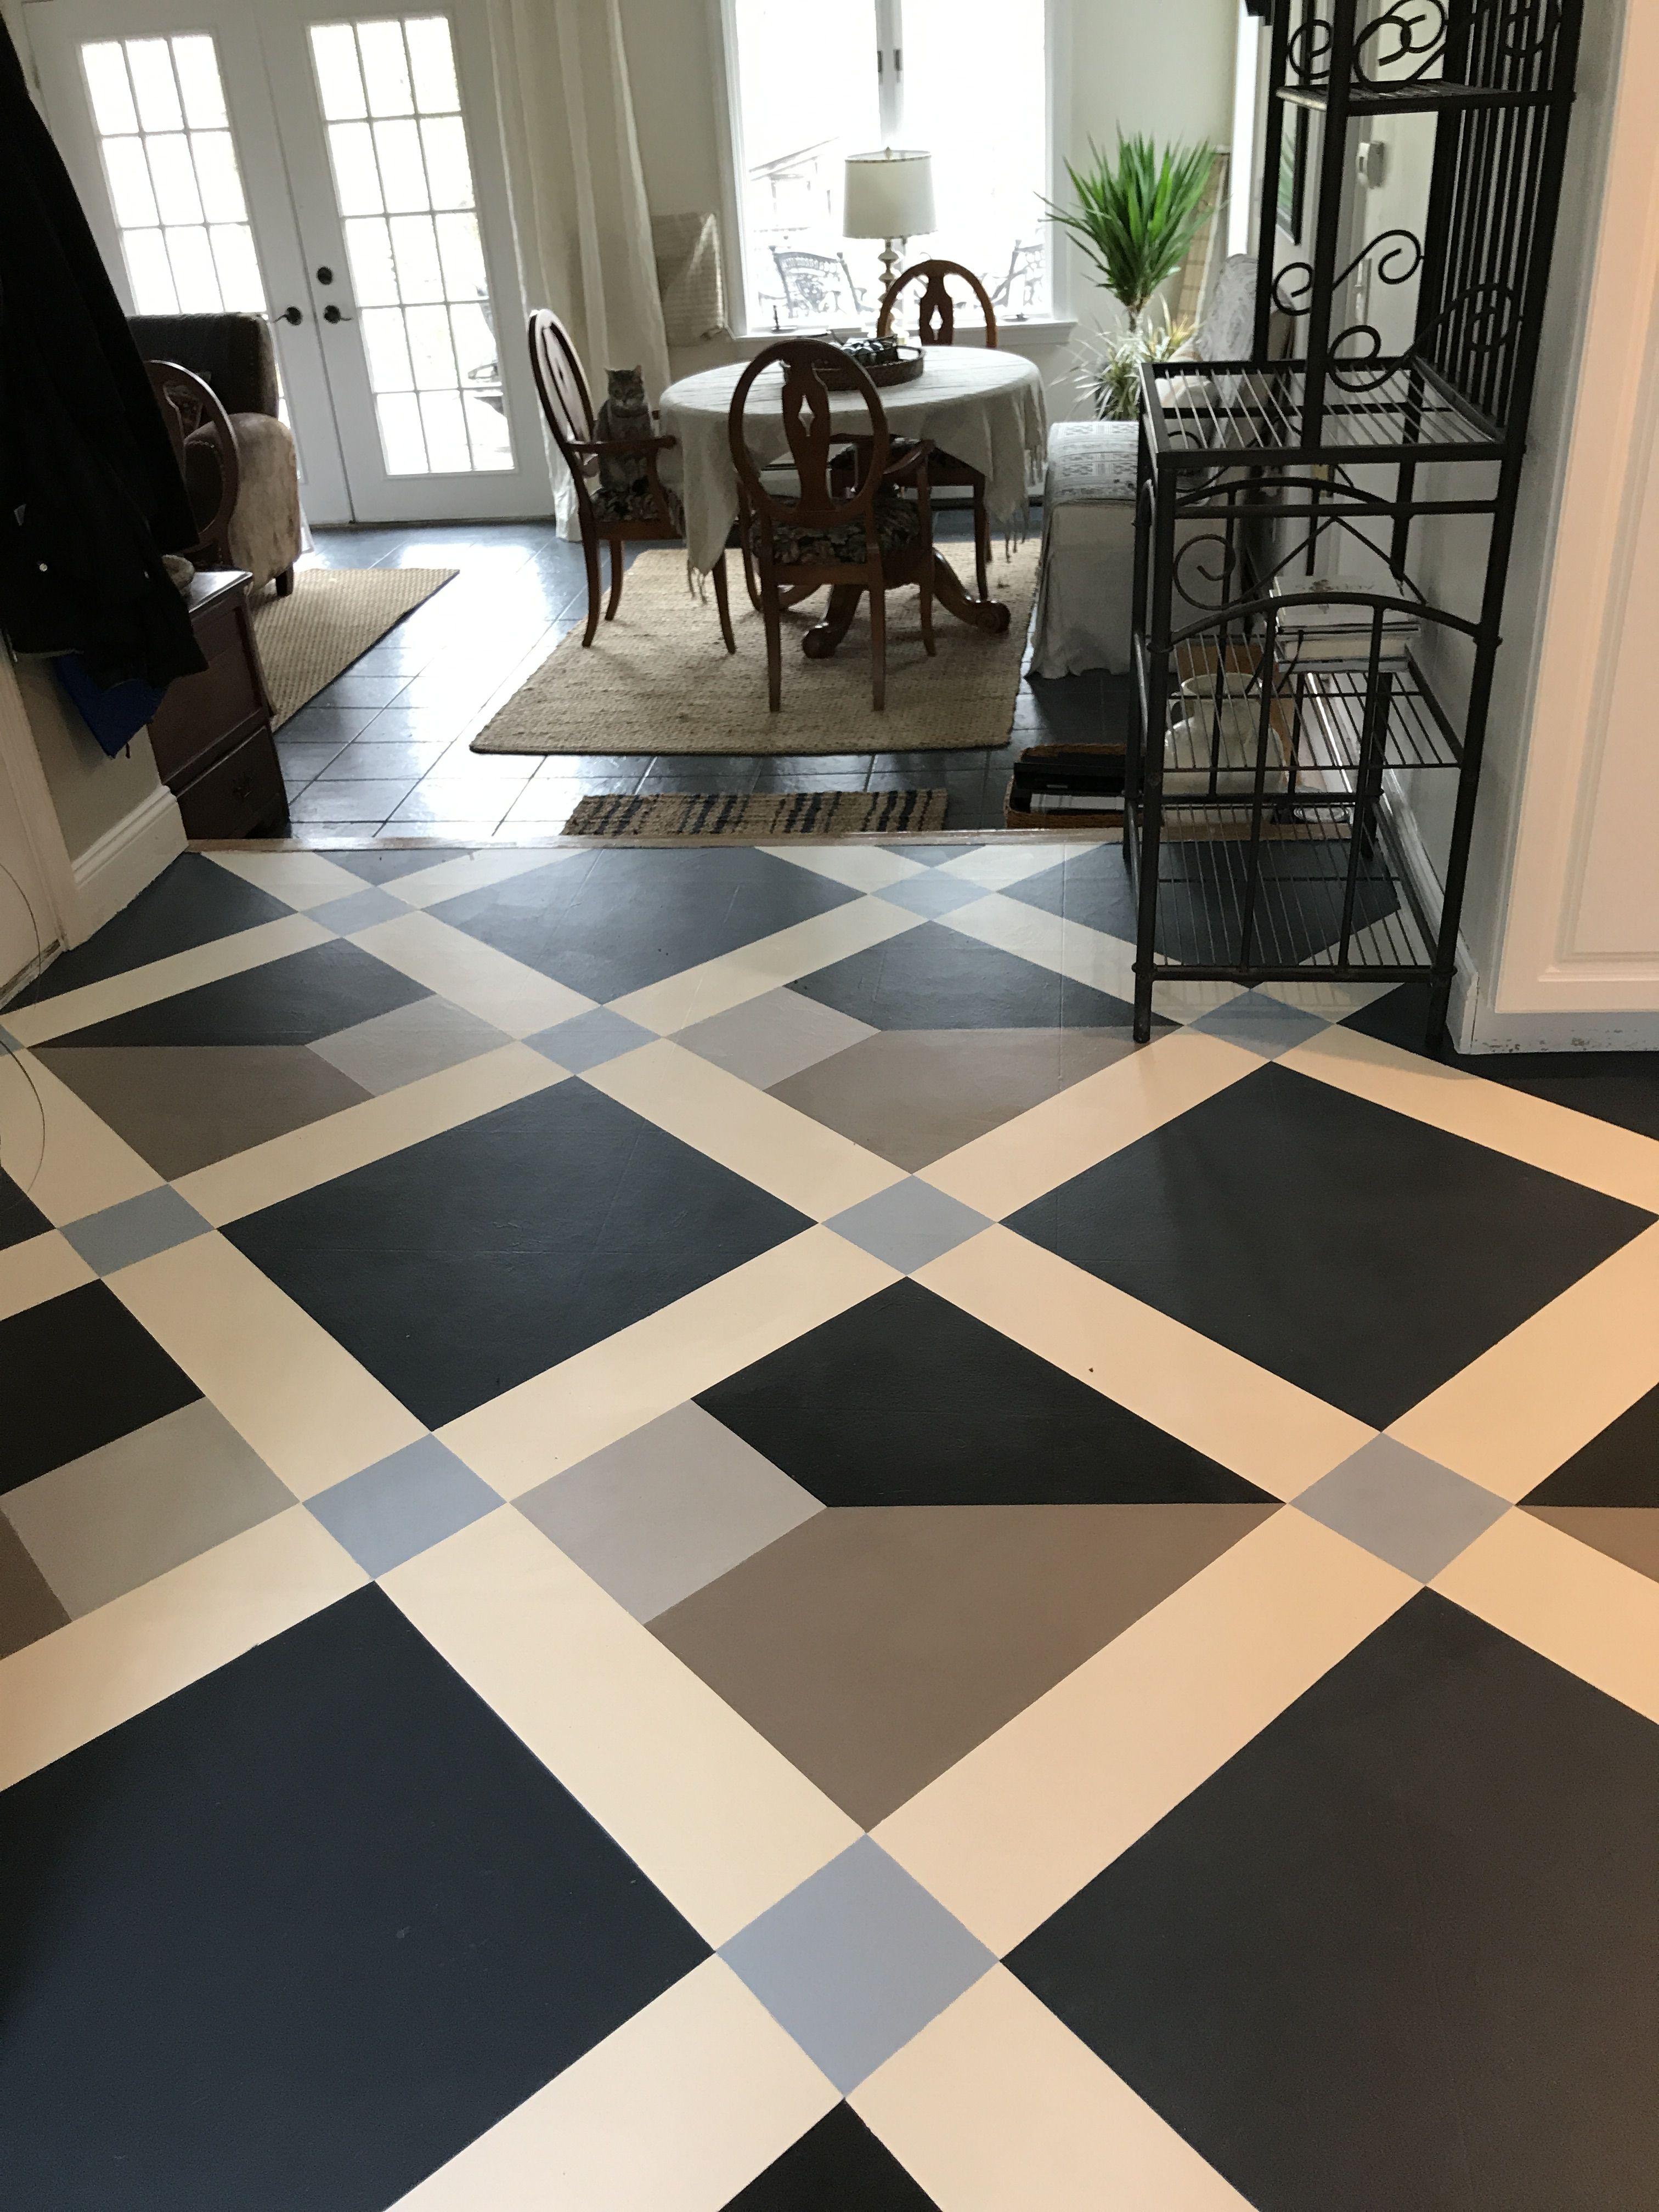 How To Paint Old Linoleum Kitchen Floors Linoleum Kitchen Floors Floor Makeover Paint Linoleum